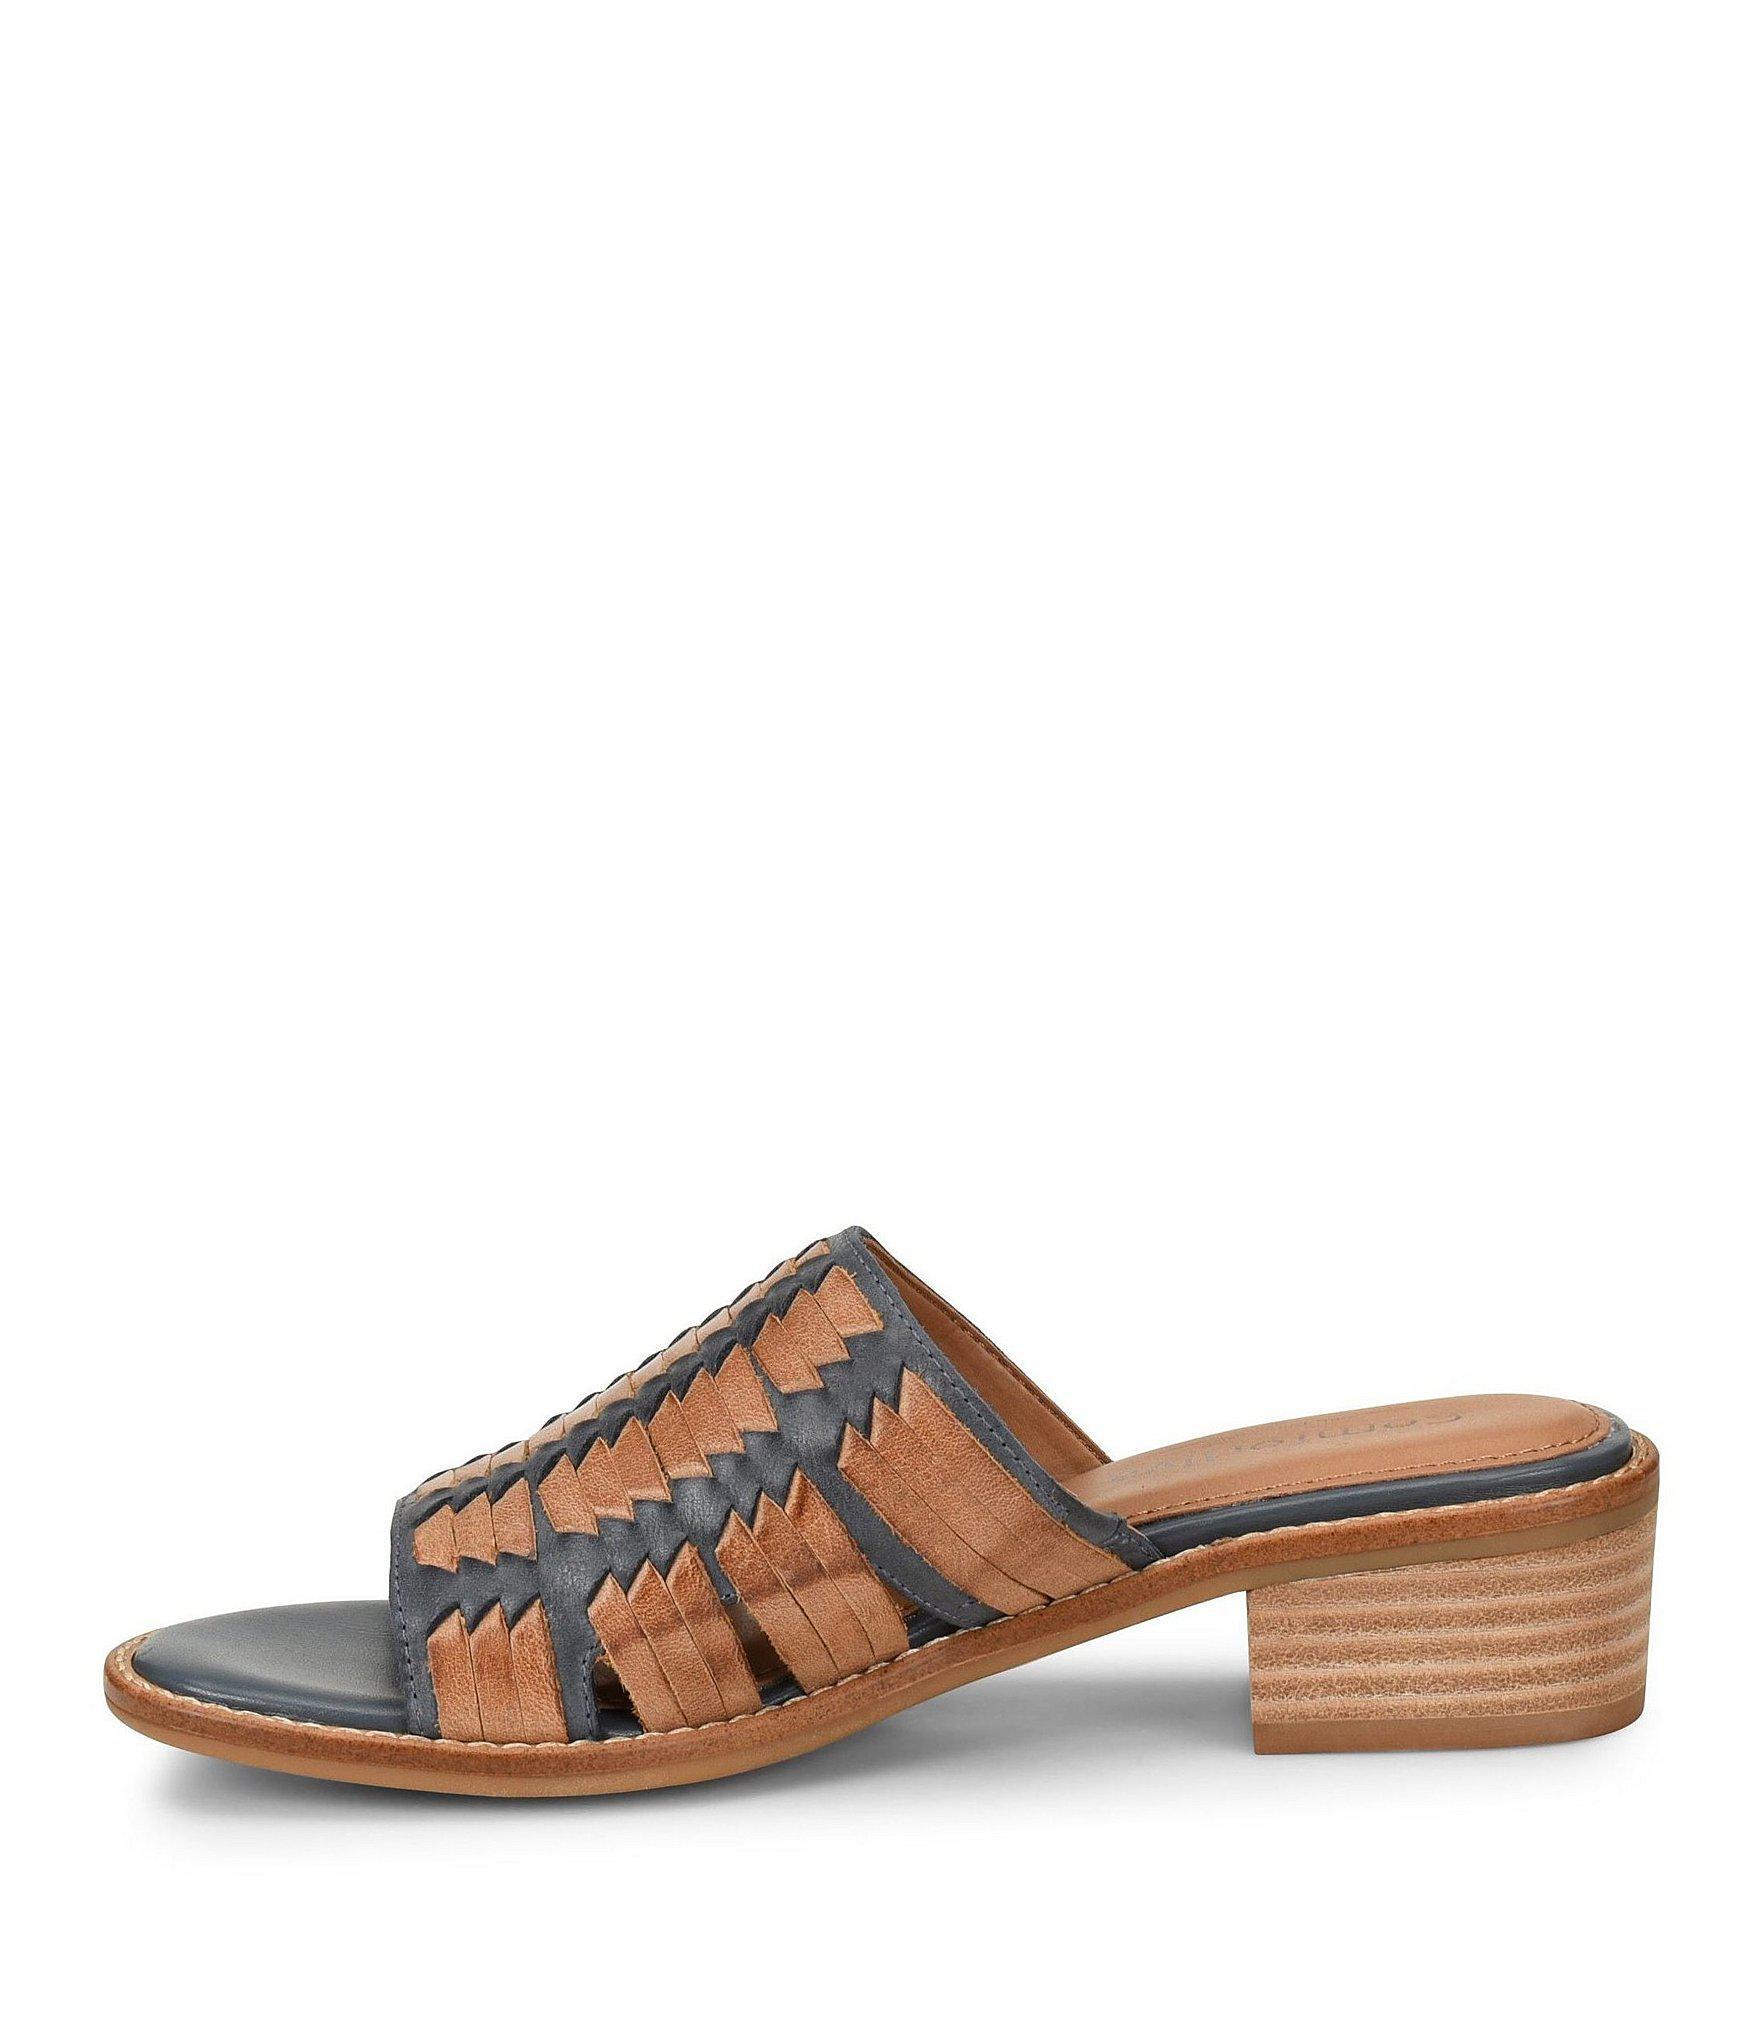 a29ca86d58e9 Comfortiva - Multicolor Brileigh Huarache Block Heel Slides - Lyst. View  fullscreen